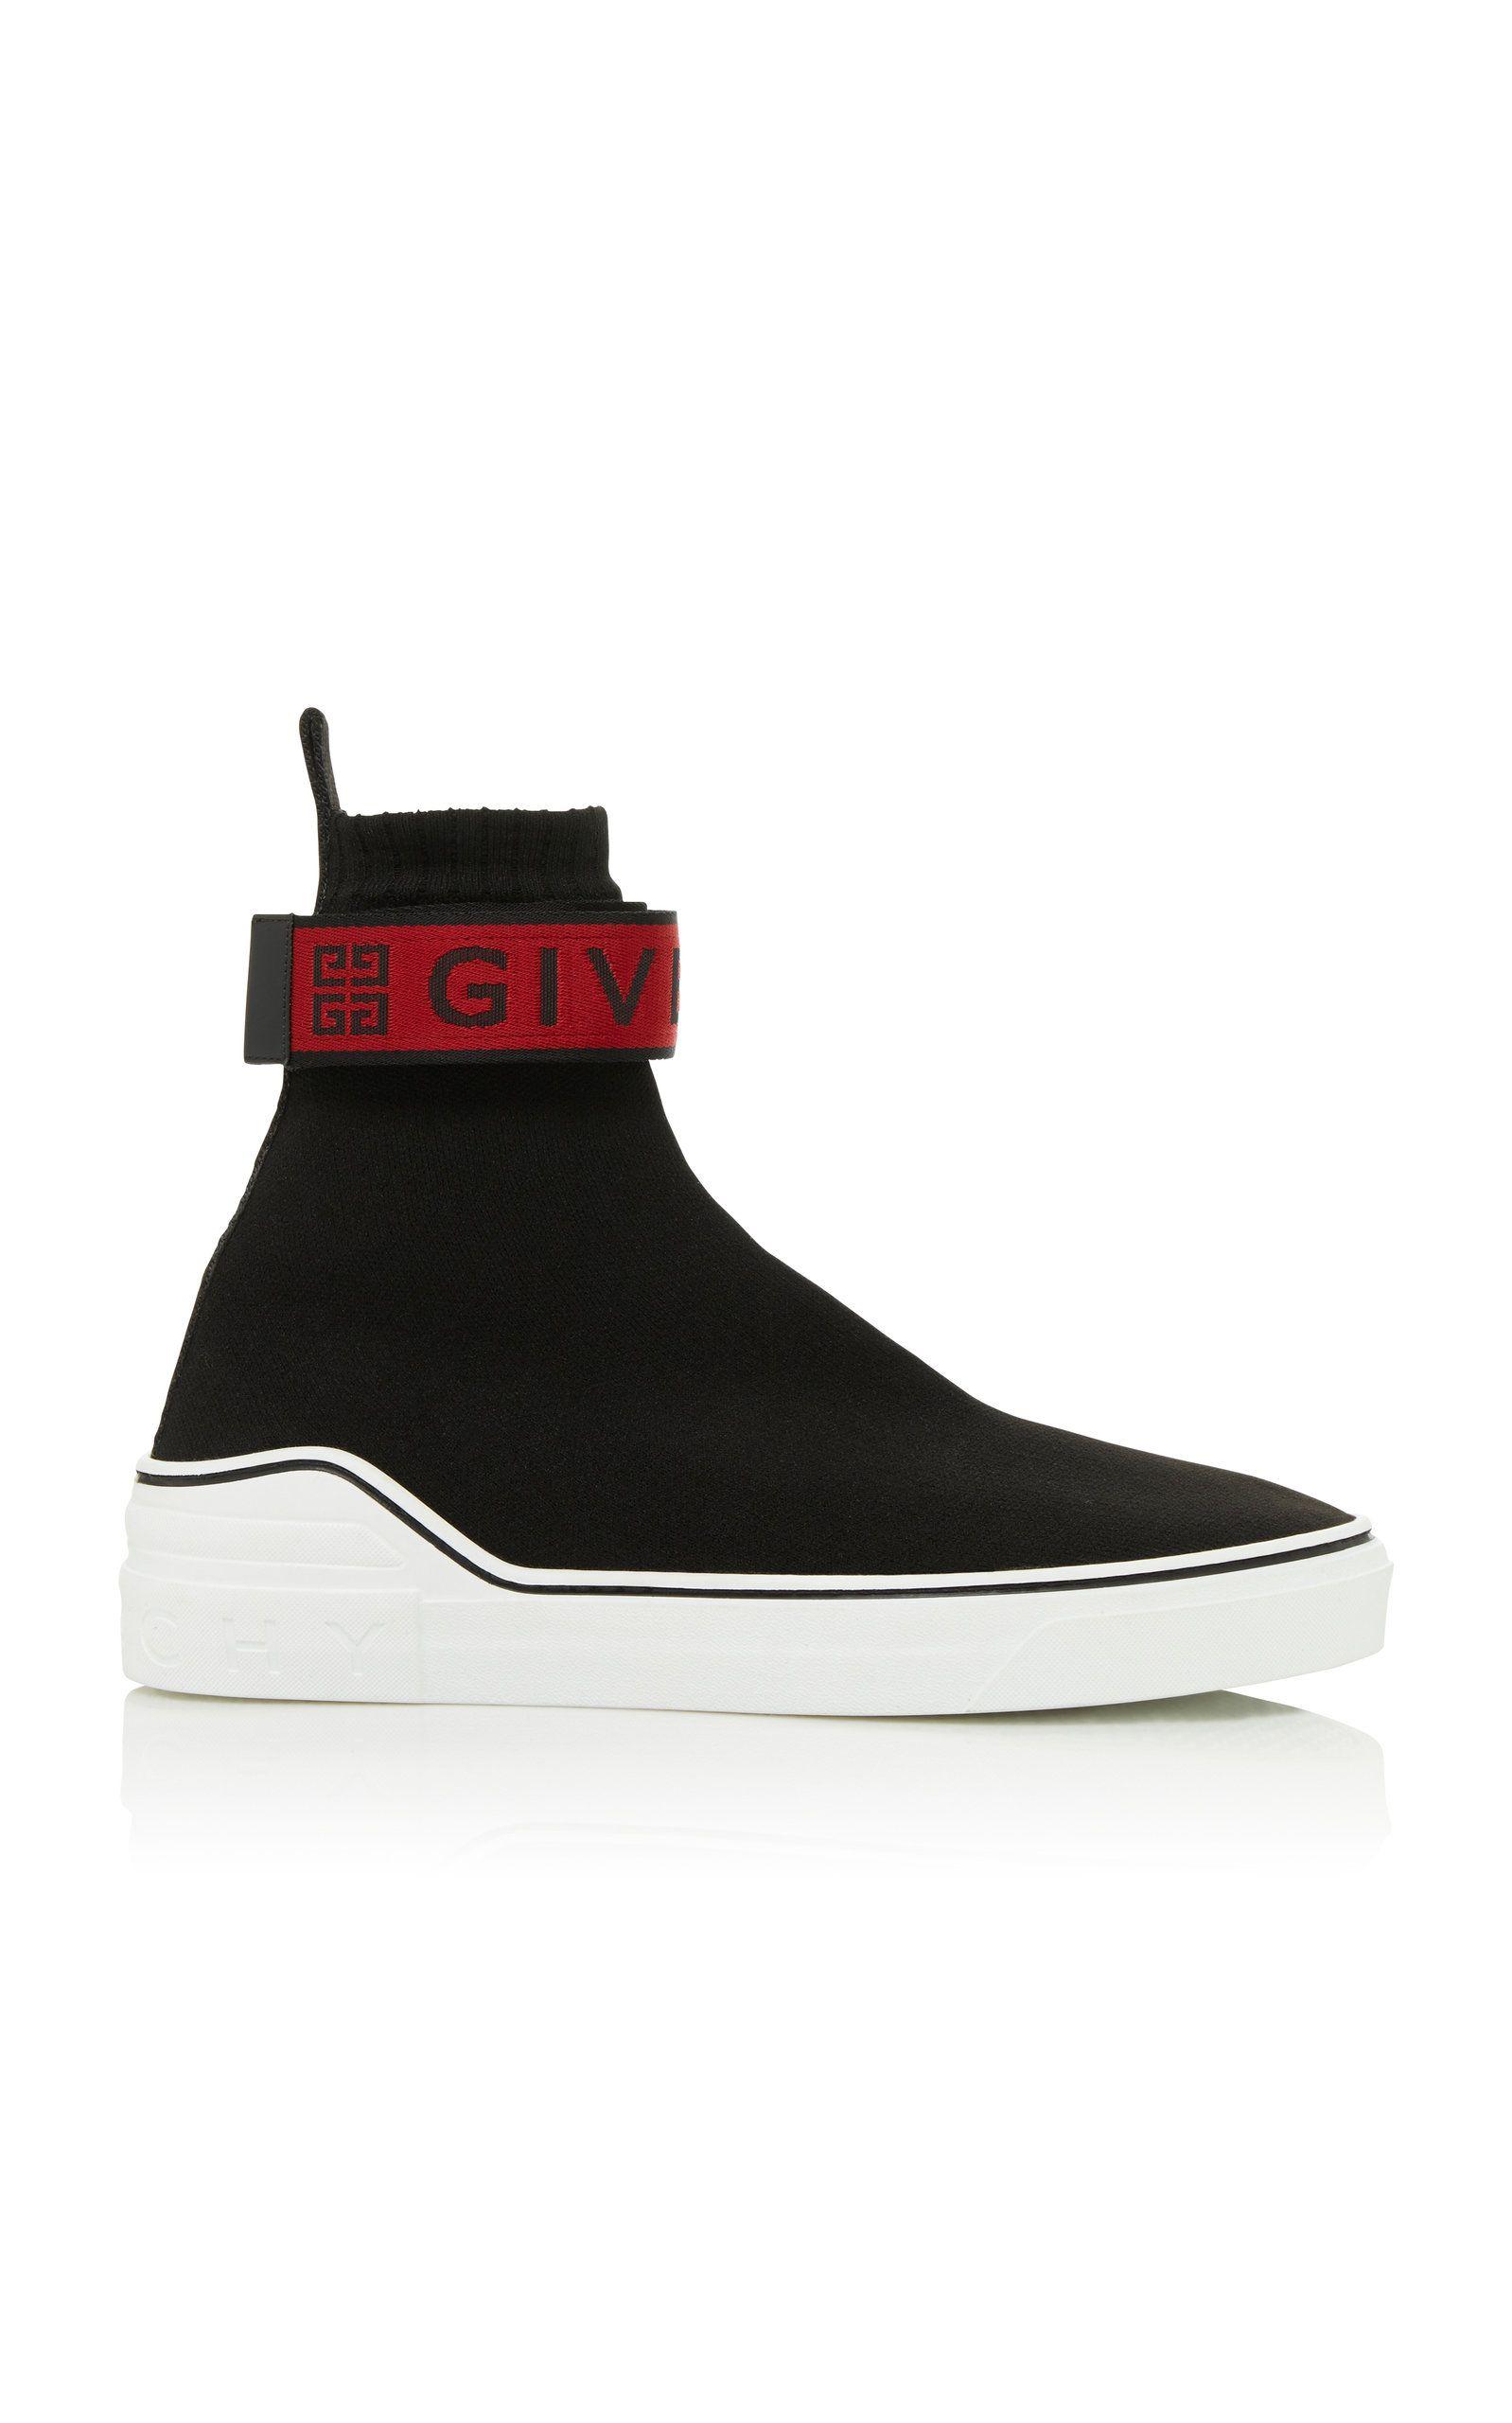 Socks sneakers, Sneakers, Sporty shoes